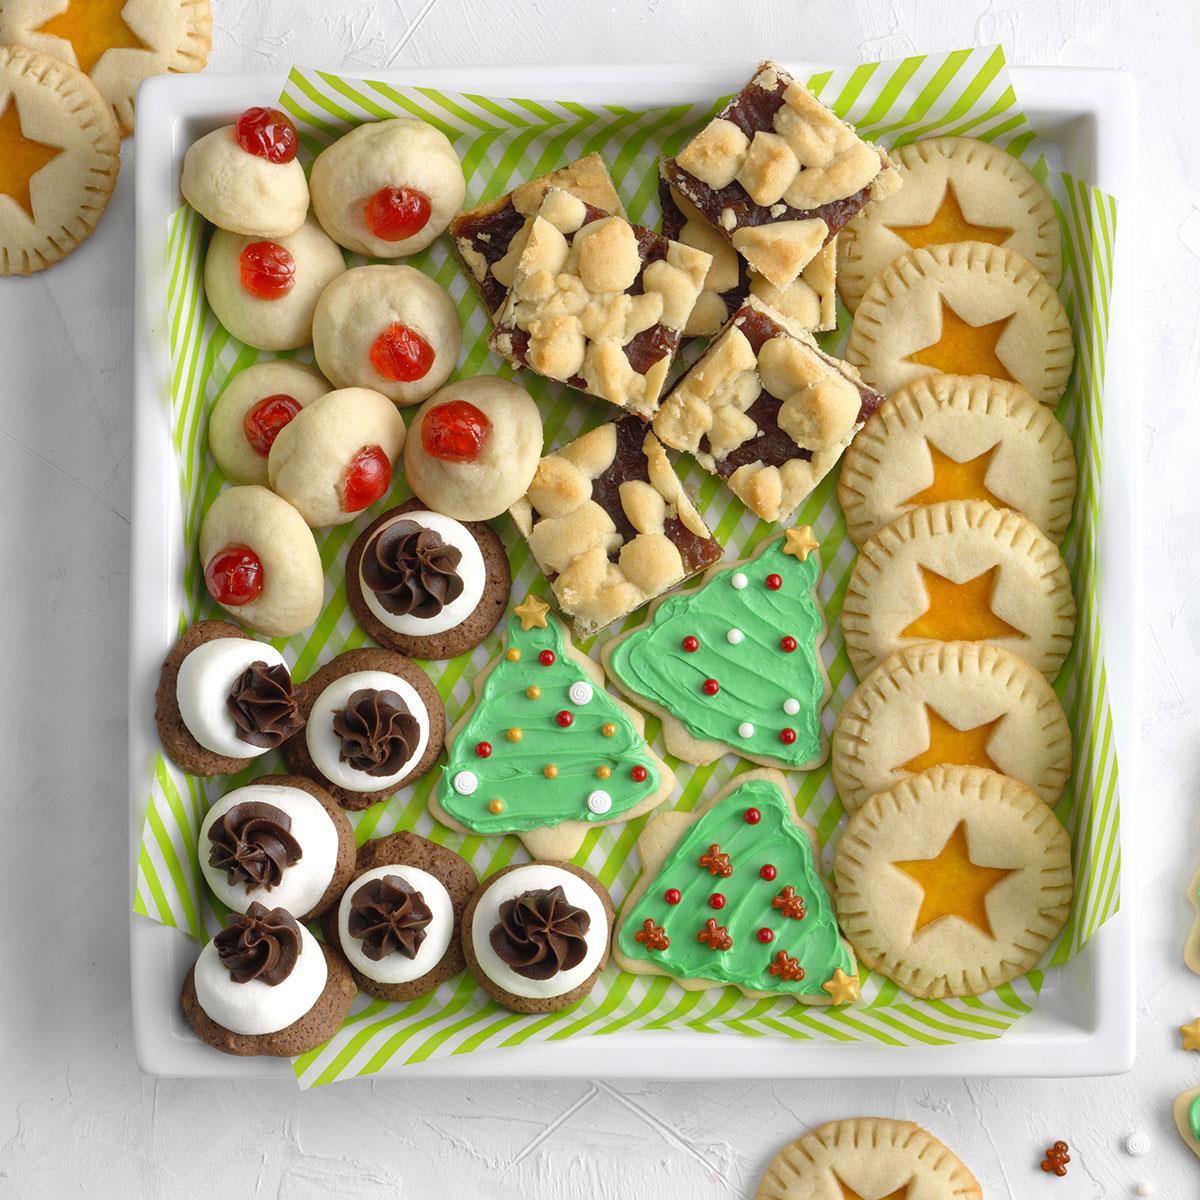 Basic Cookie Dough_image